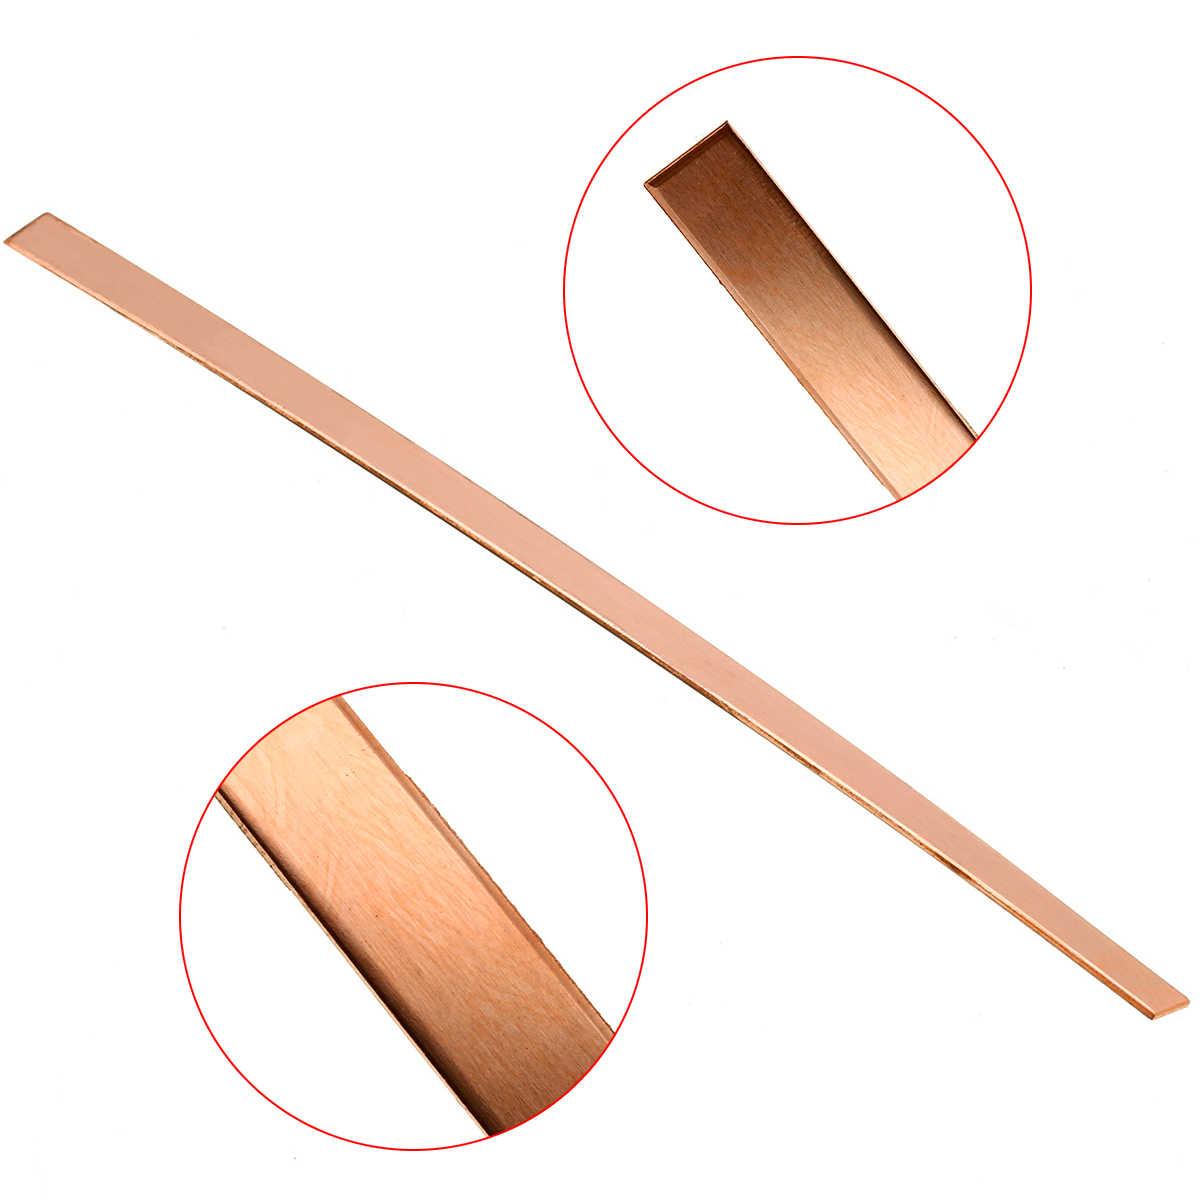 12mm Thickness Copper Bar 99.9/% Pure Copper Strip T2 Cu Metal Sheet for DIY PCB Kit Laminate Circuit Board 50mm200mm